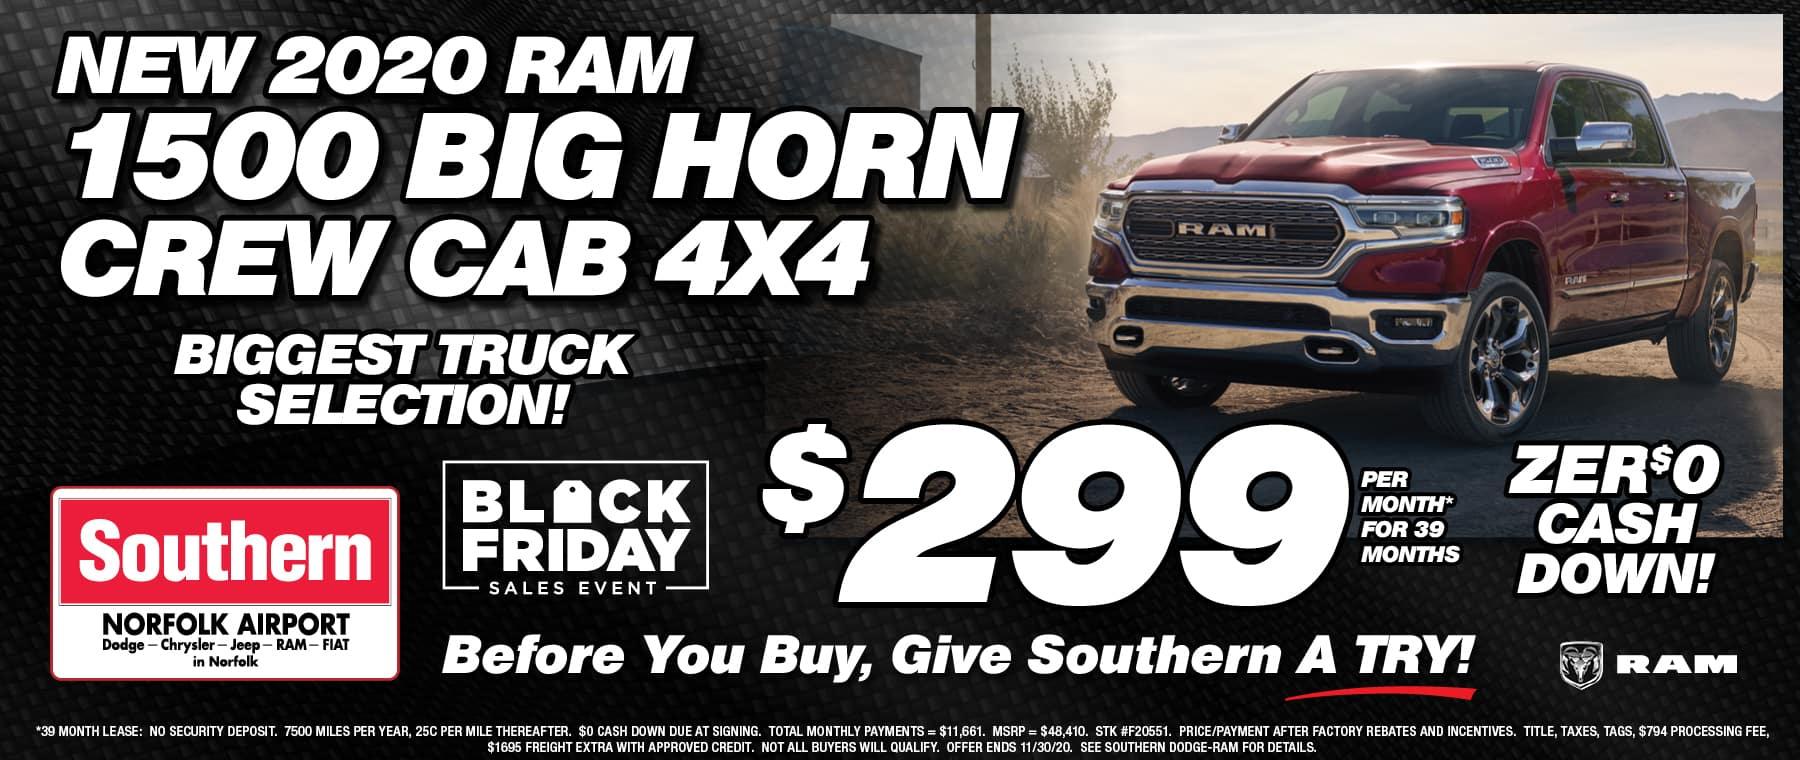 Ram Truck Southern Dodge November